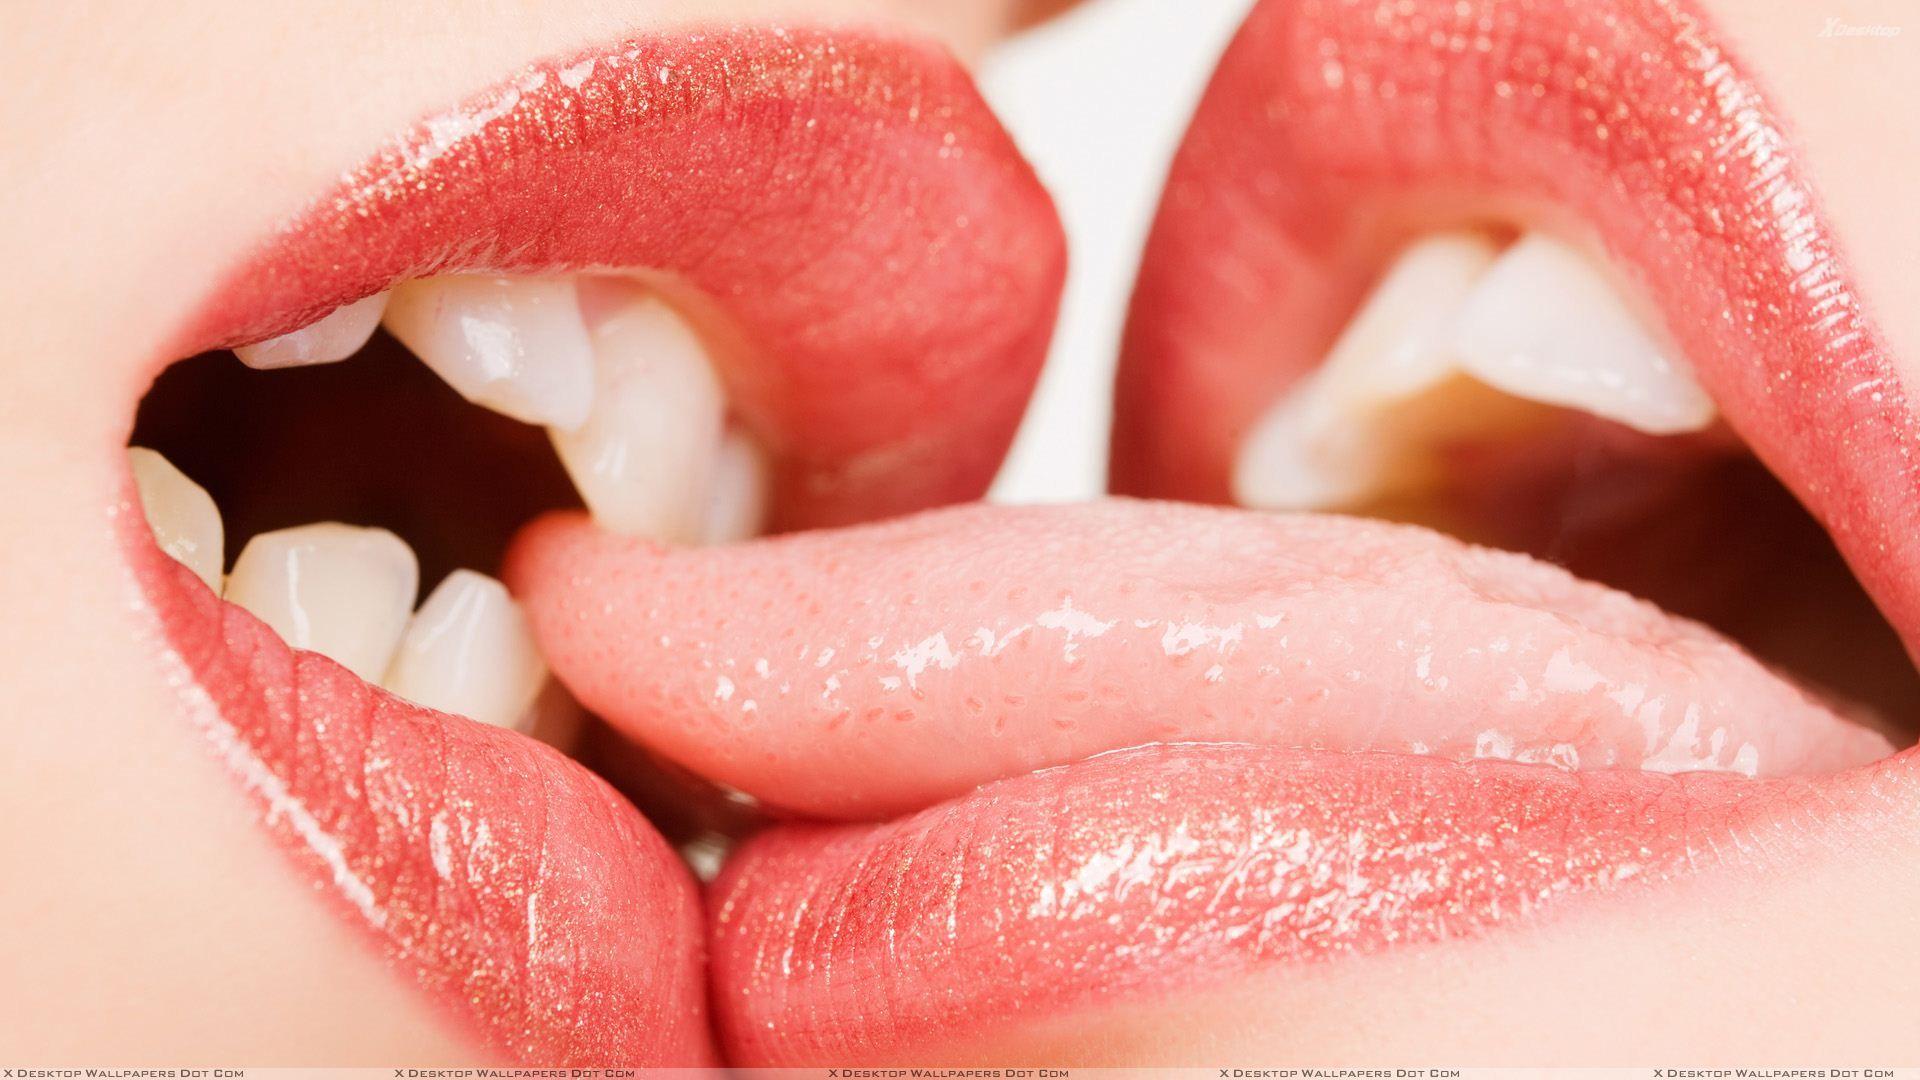 lips Red Glossy Lips Kissing Wallpaper hot lips Kiss images 1920x1080